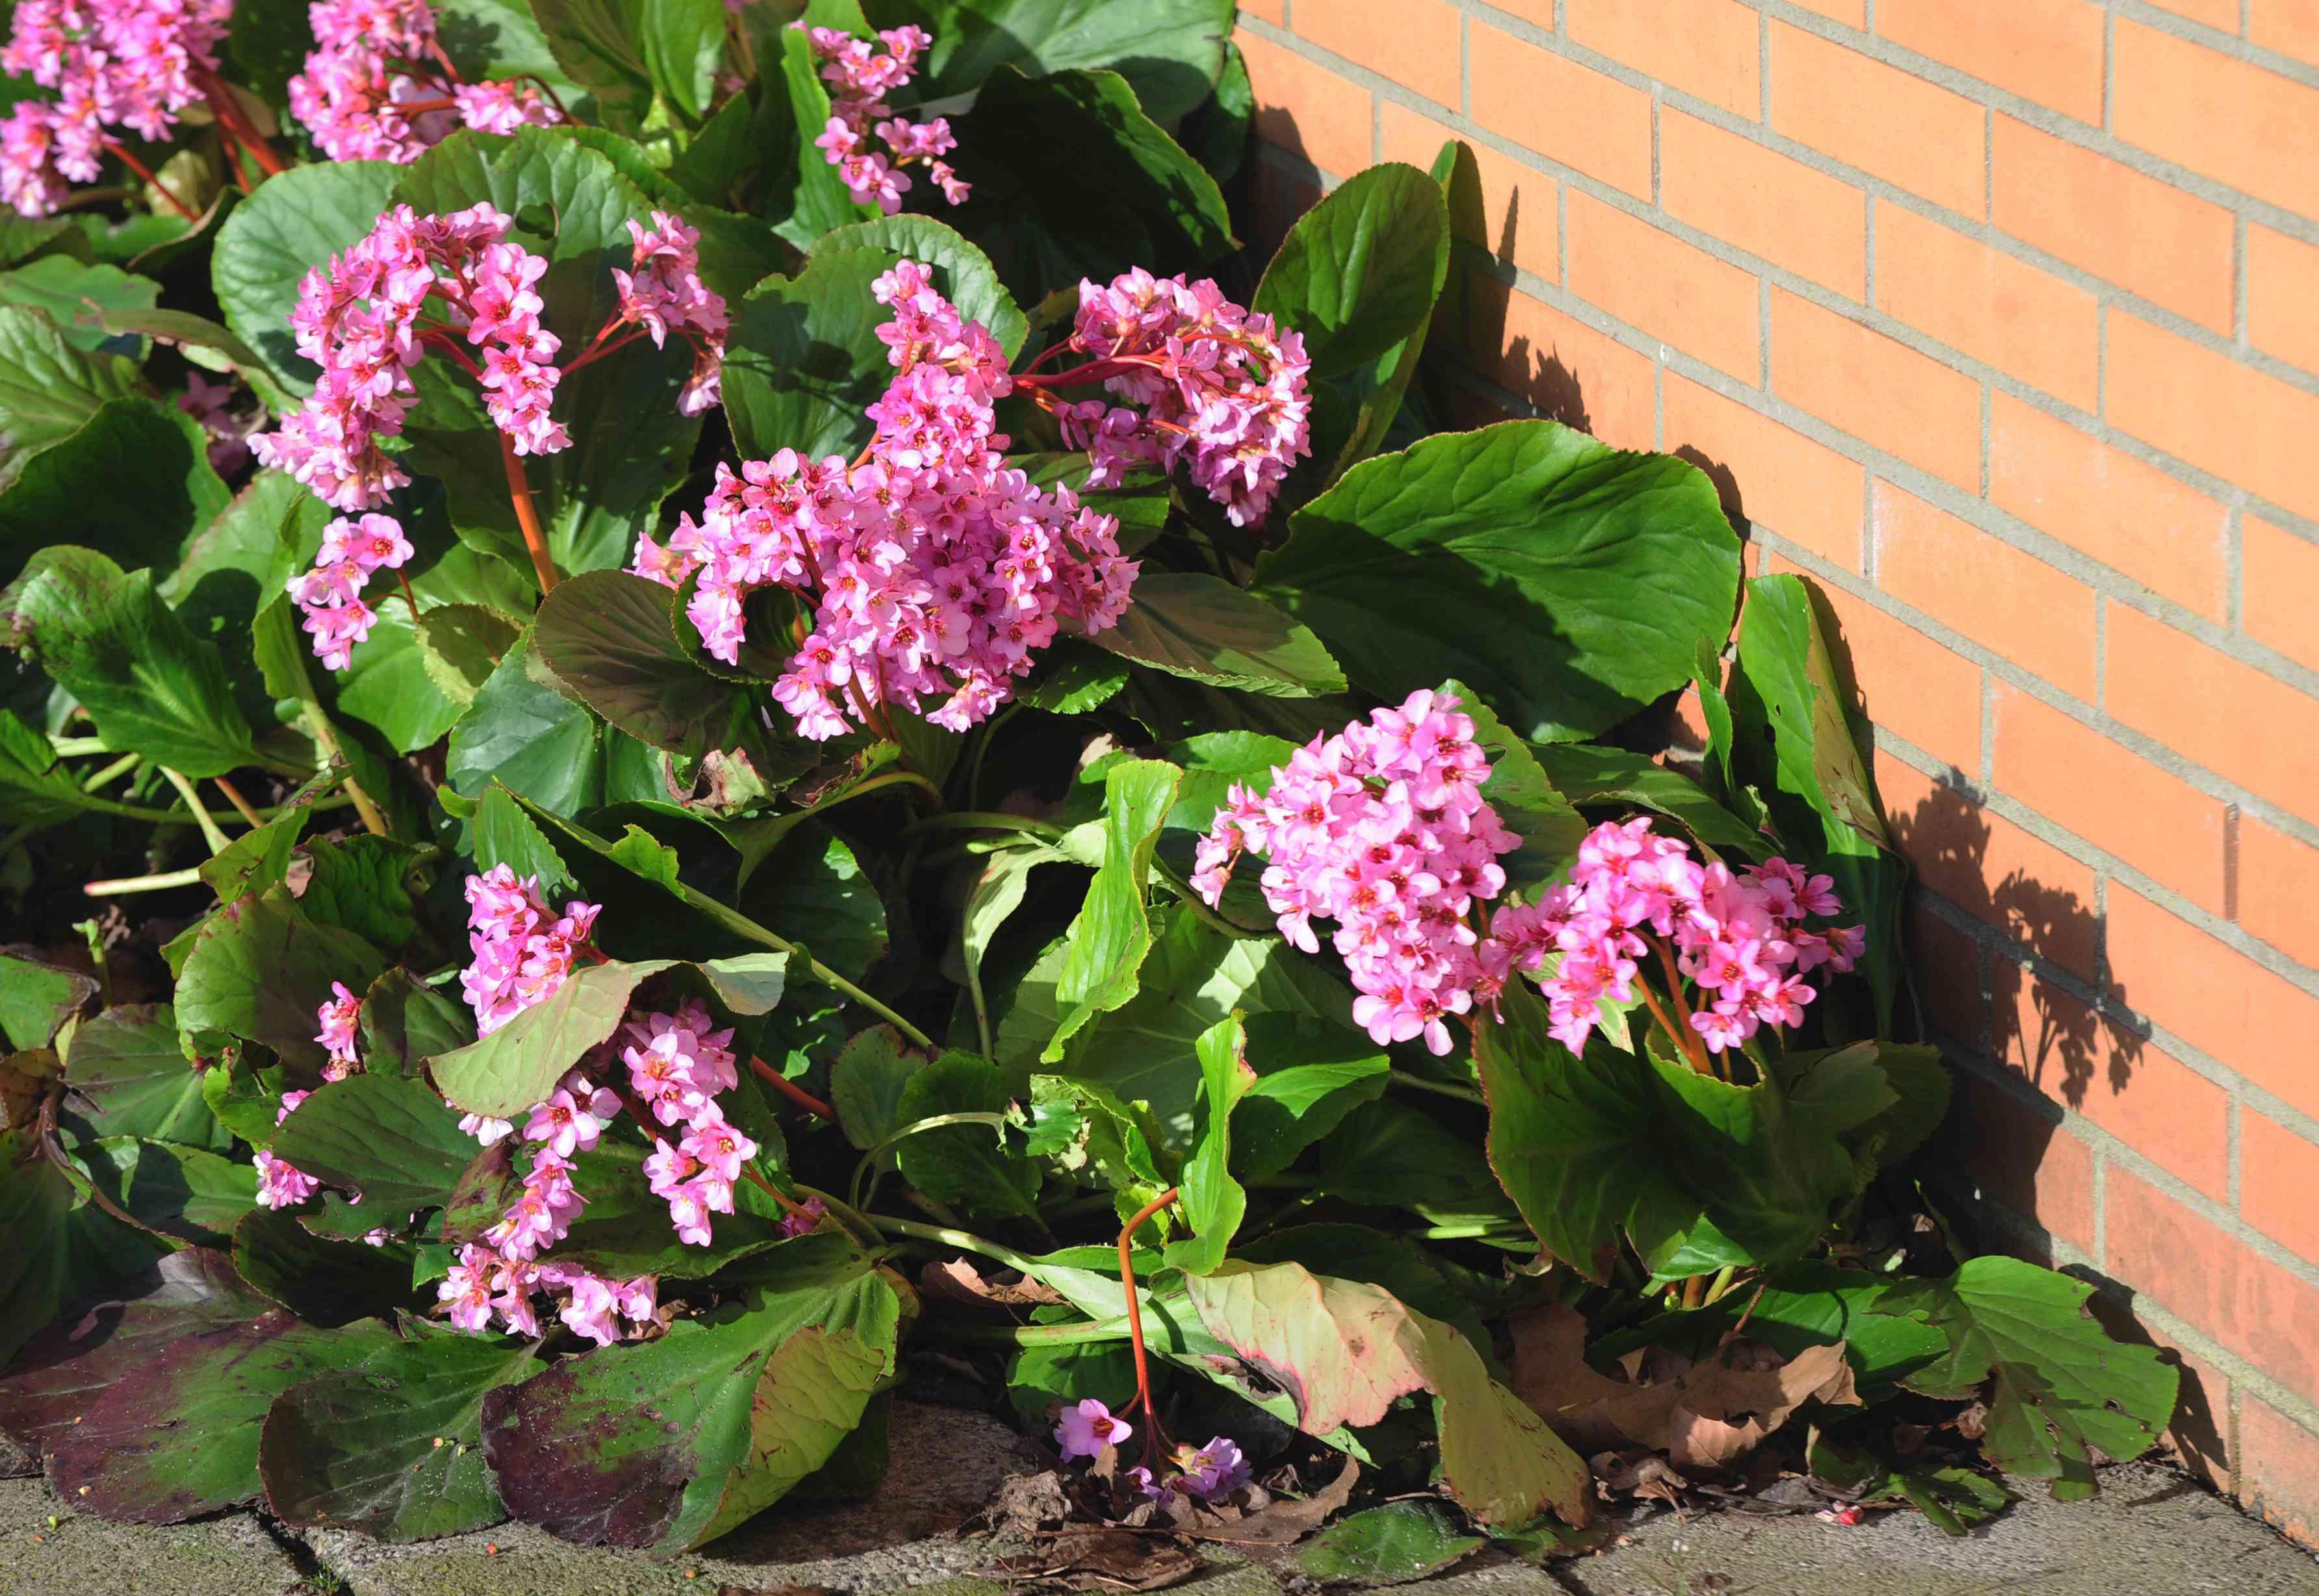 Bergenia plants